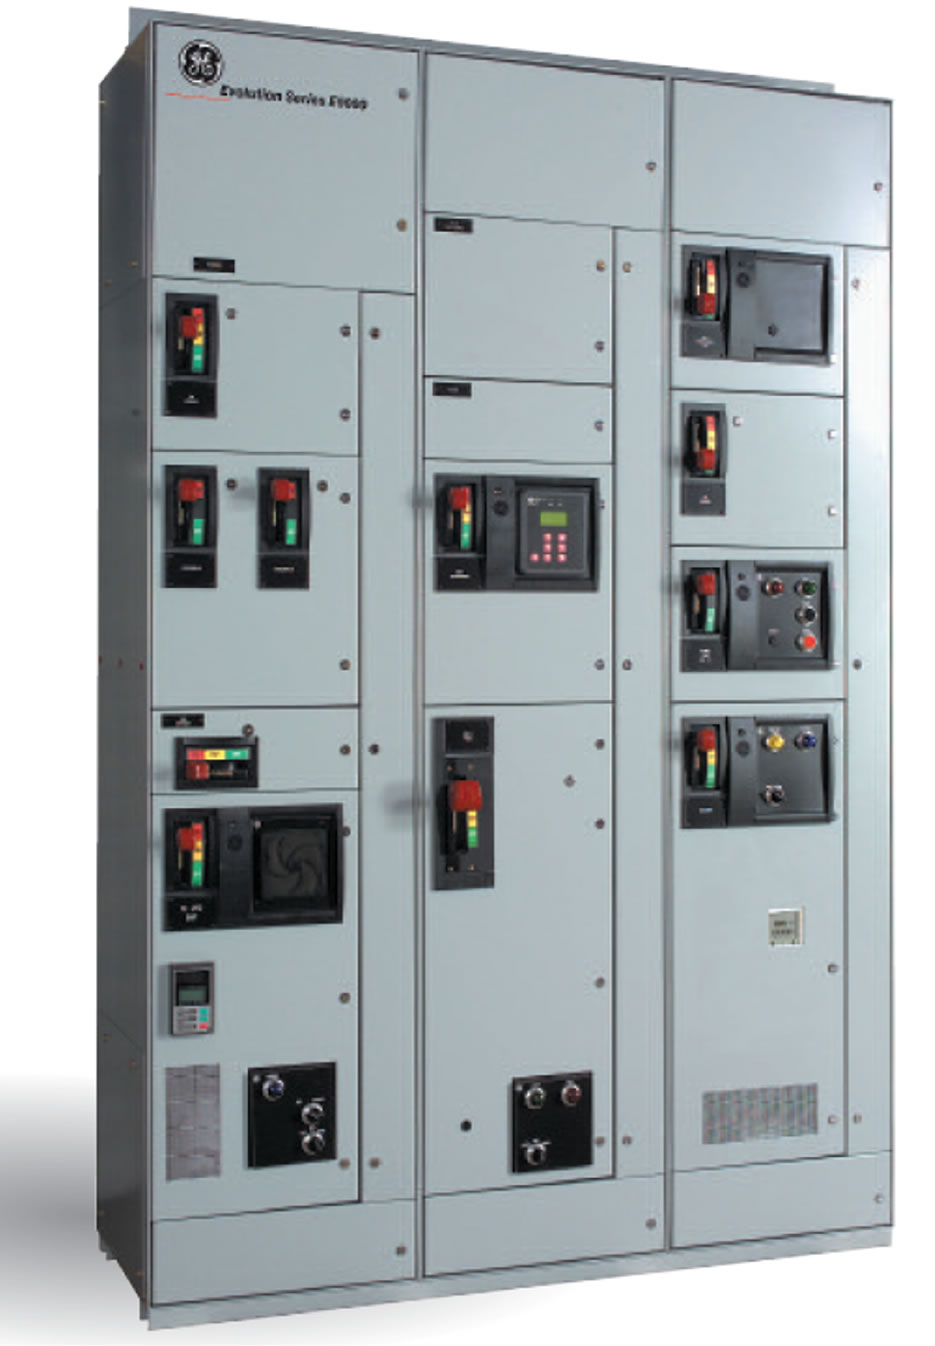 California Industrial Refrigeration Machines 24 Hour